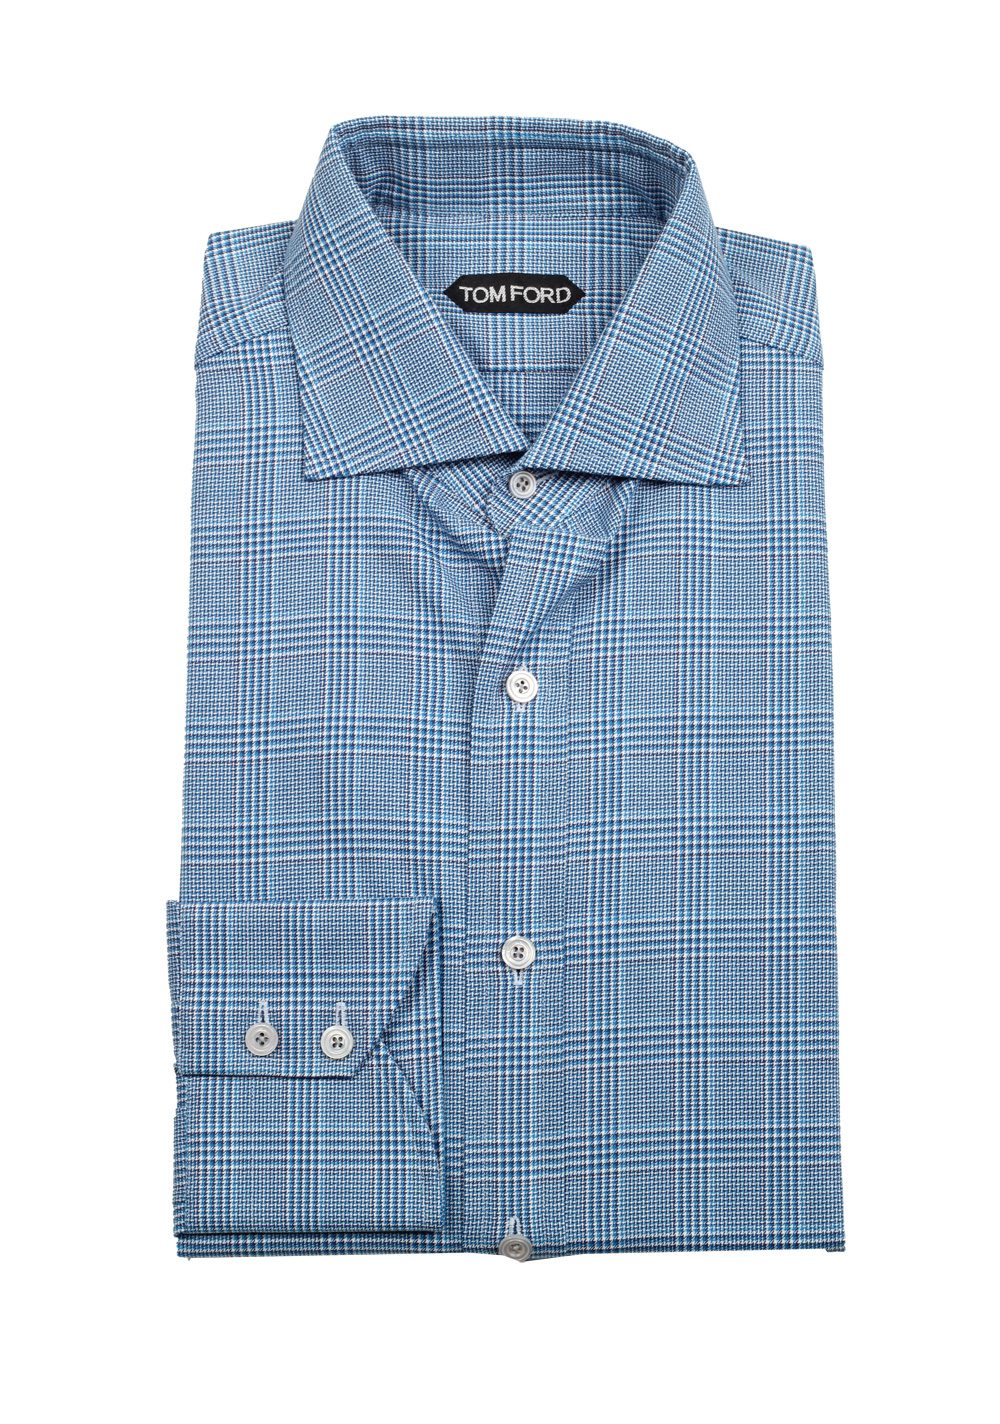 TOM FORD Checked White Blue Shirt Size 41 / 16 U.S.   Costume Limité